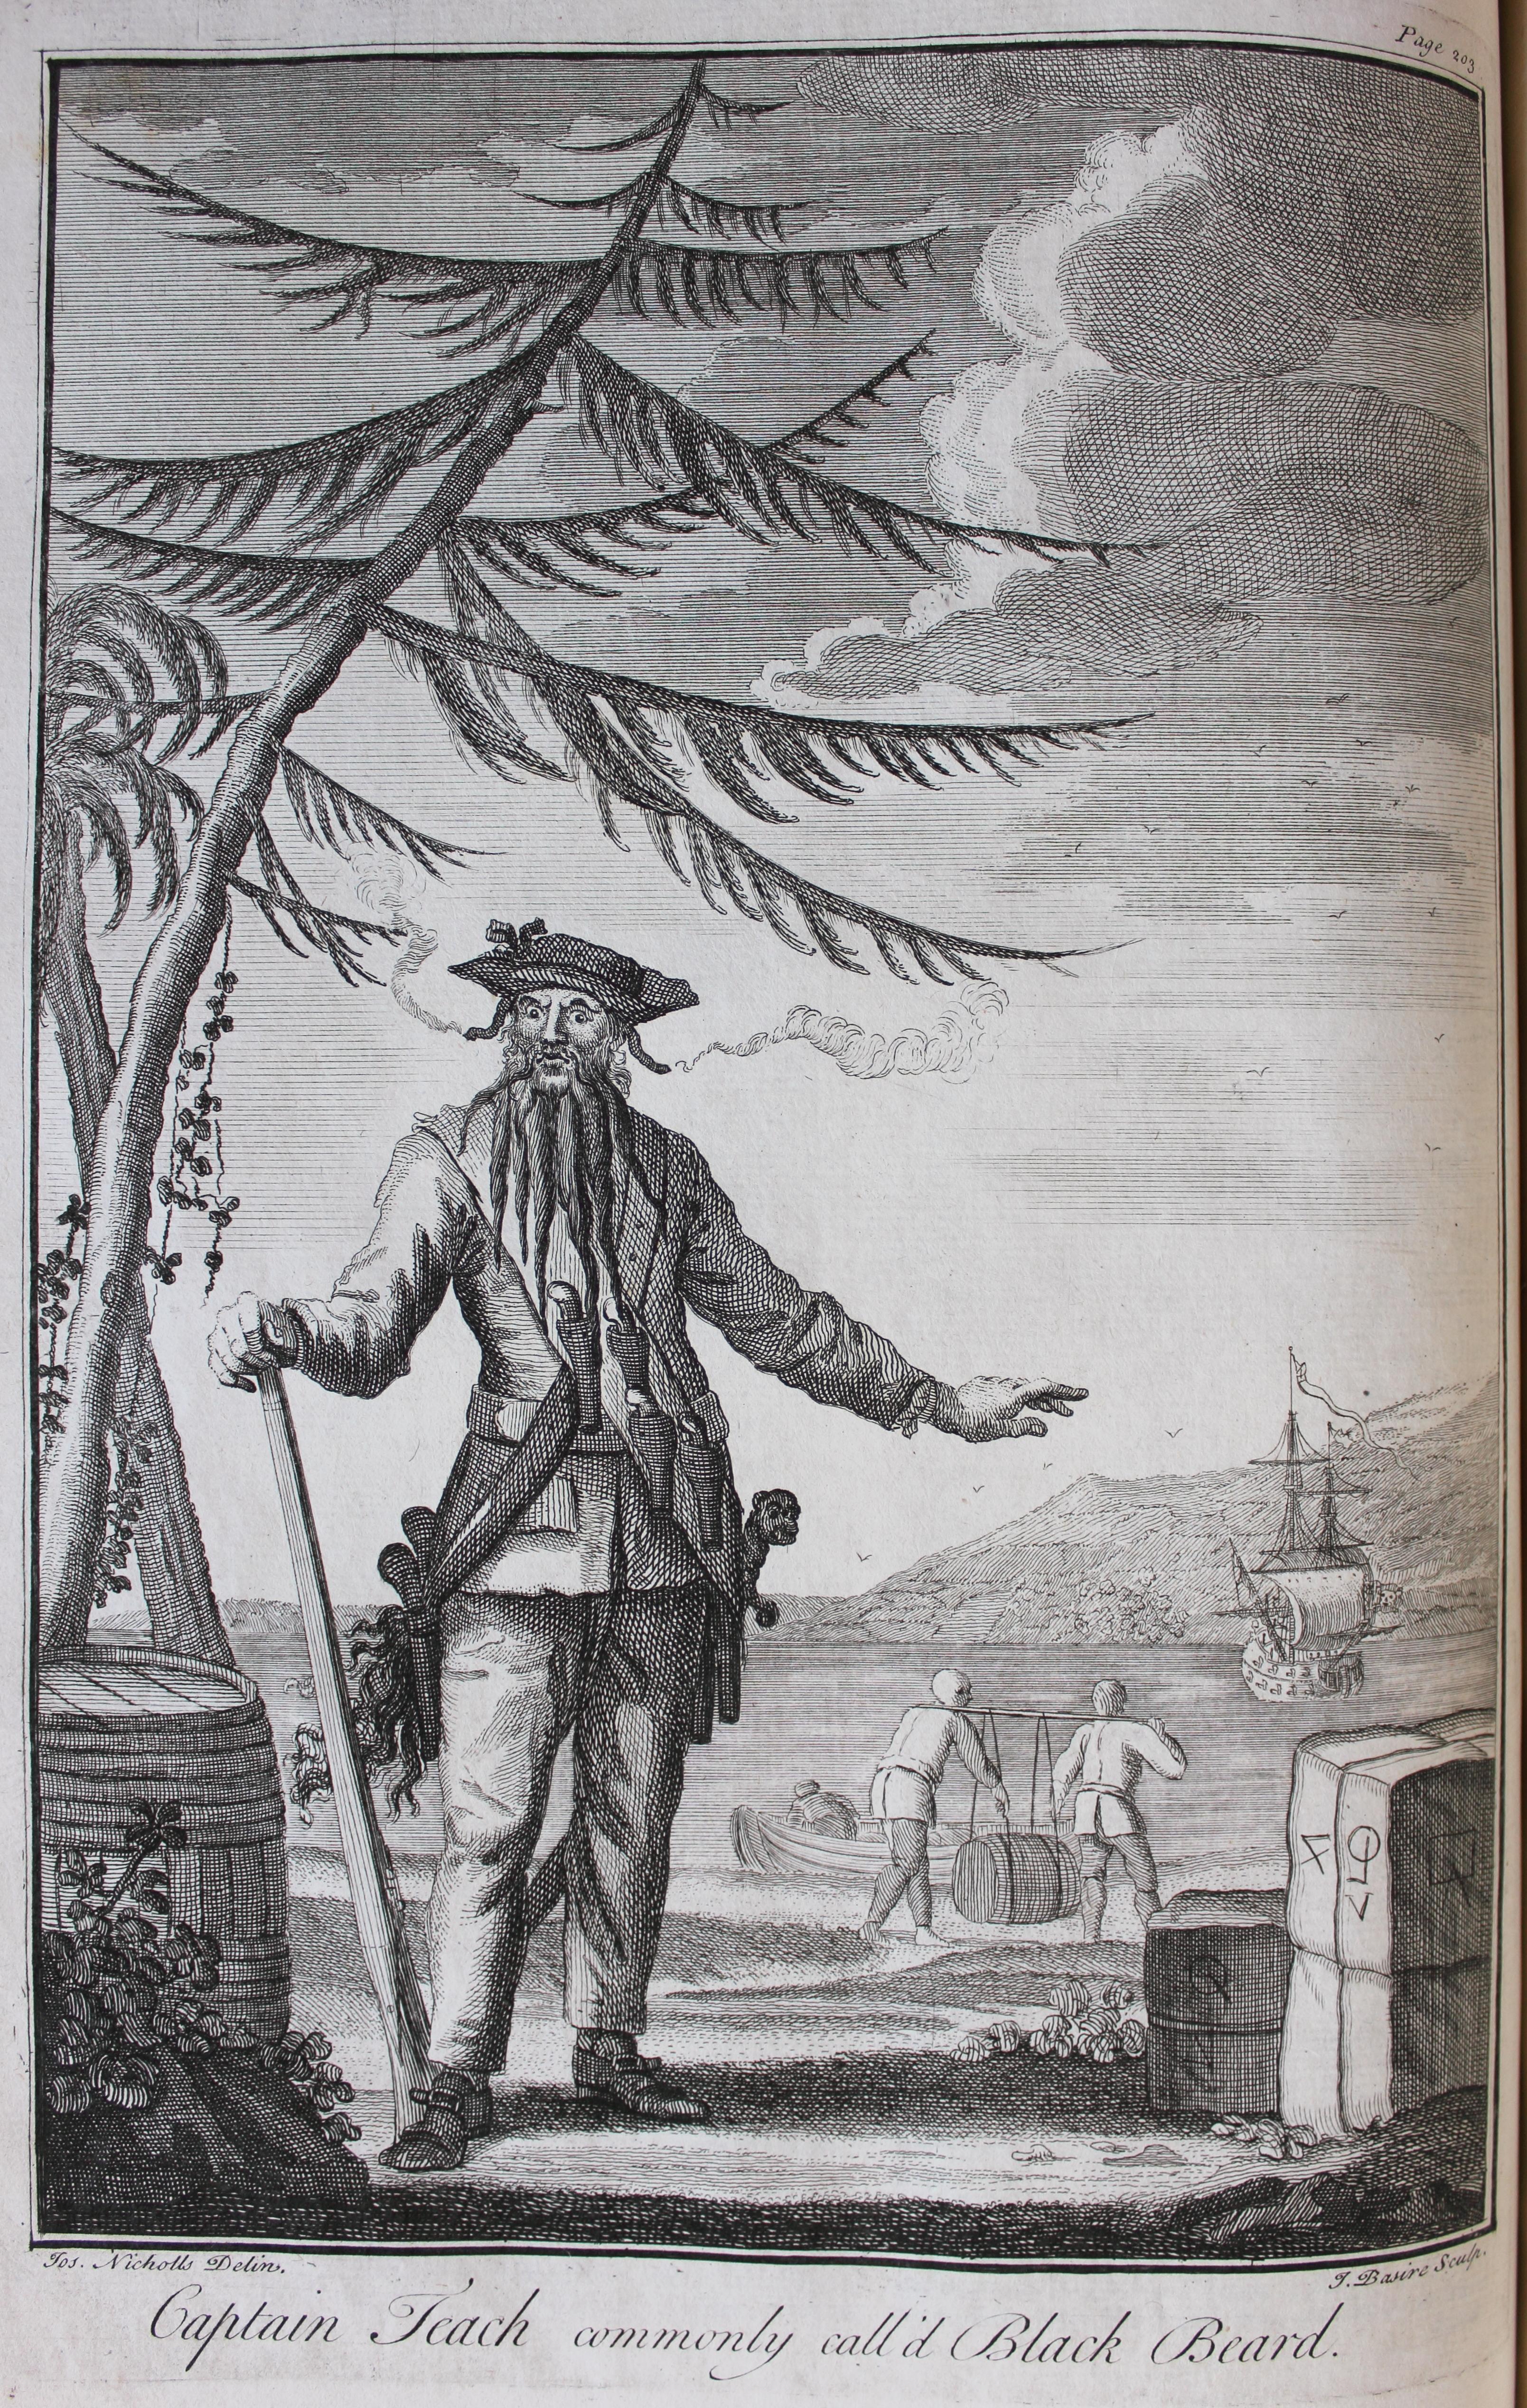 Thackeray.Q.29.9 facing page 203 Blackbeard